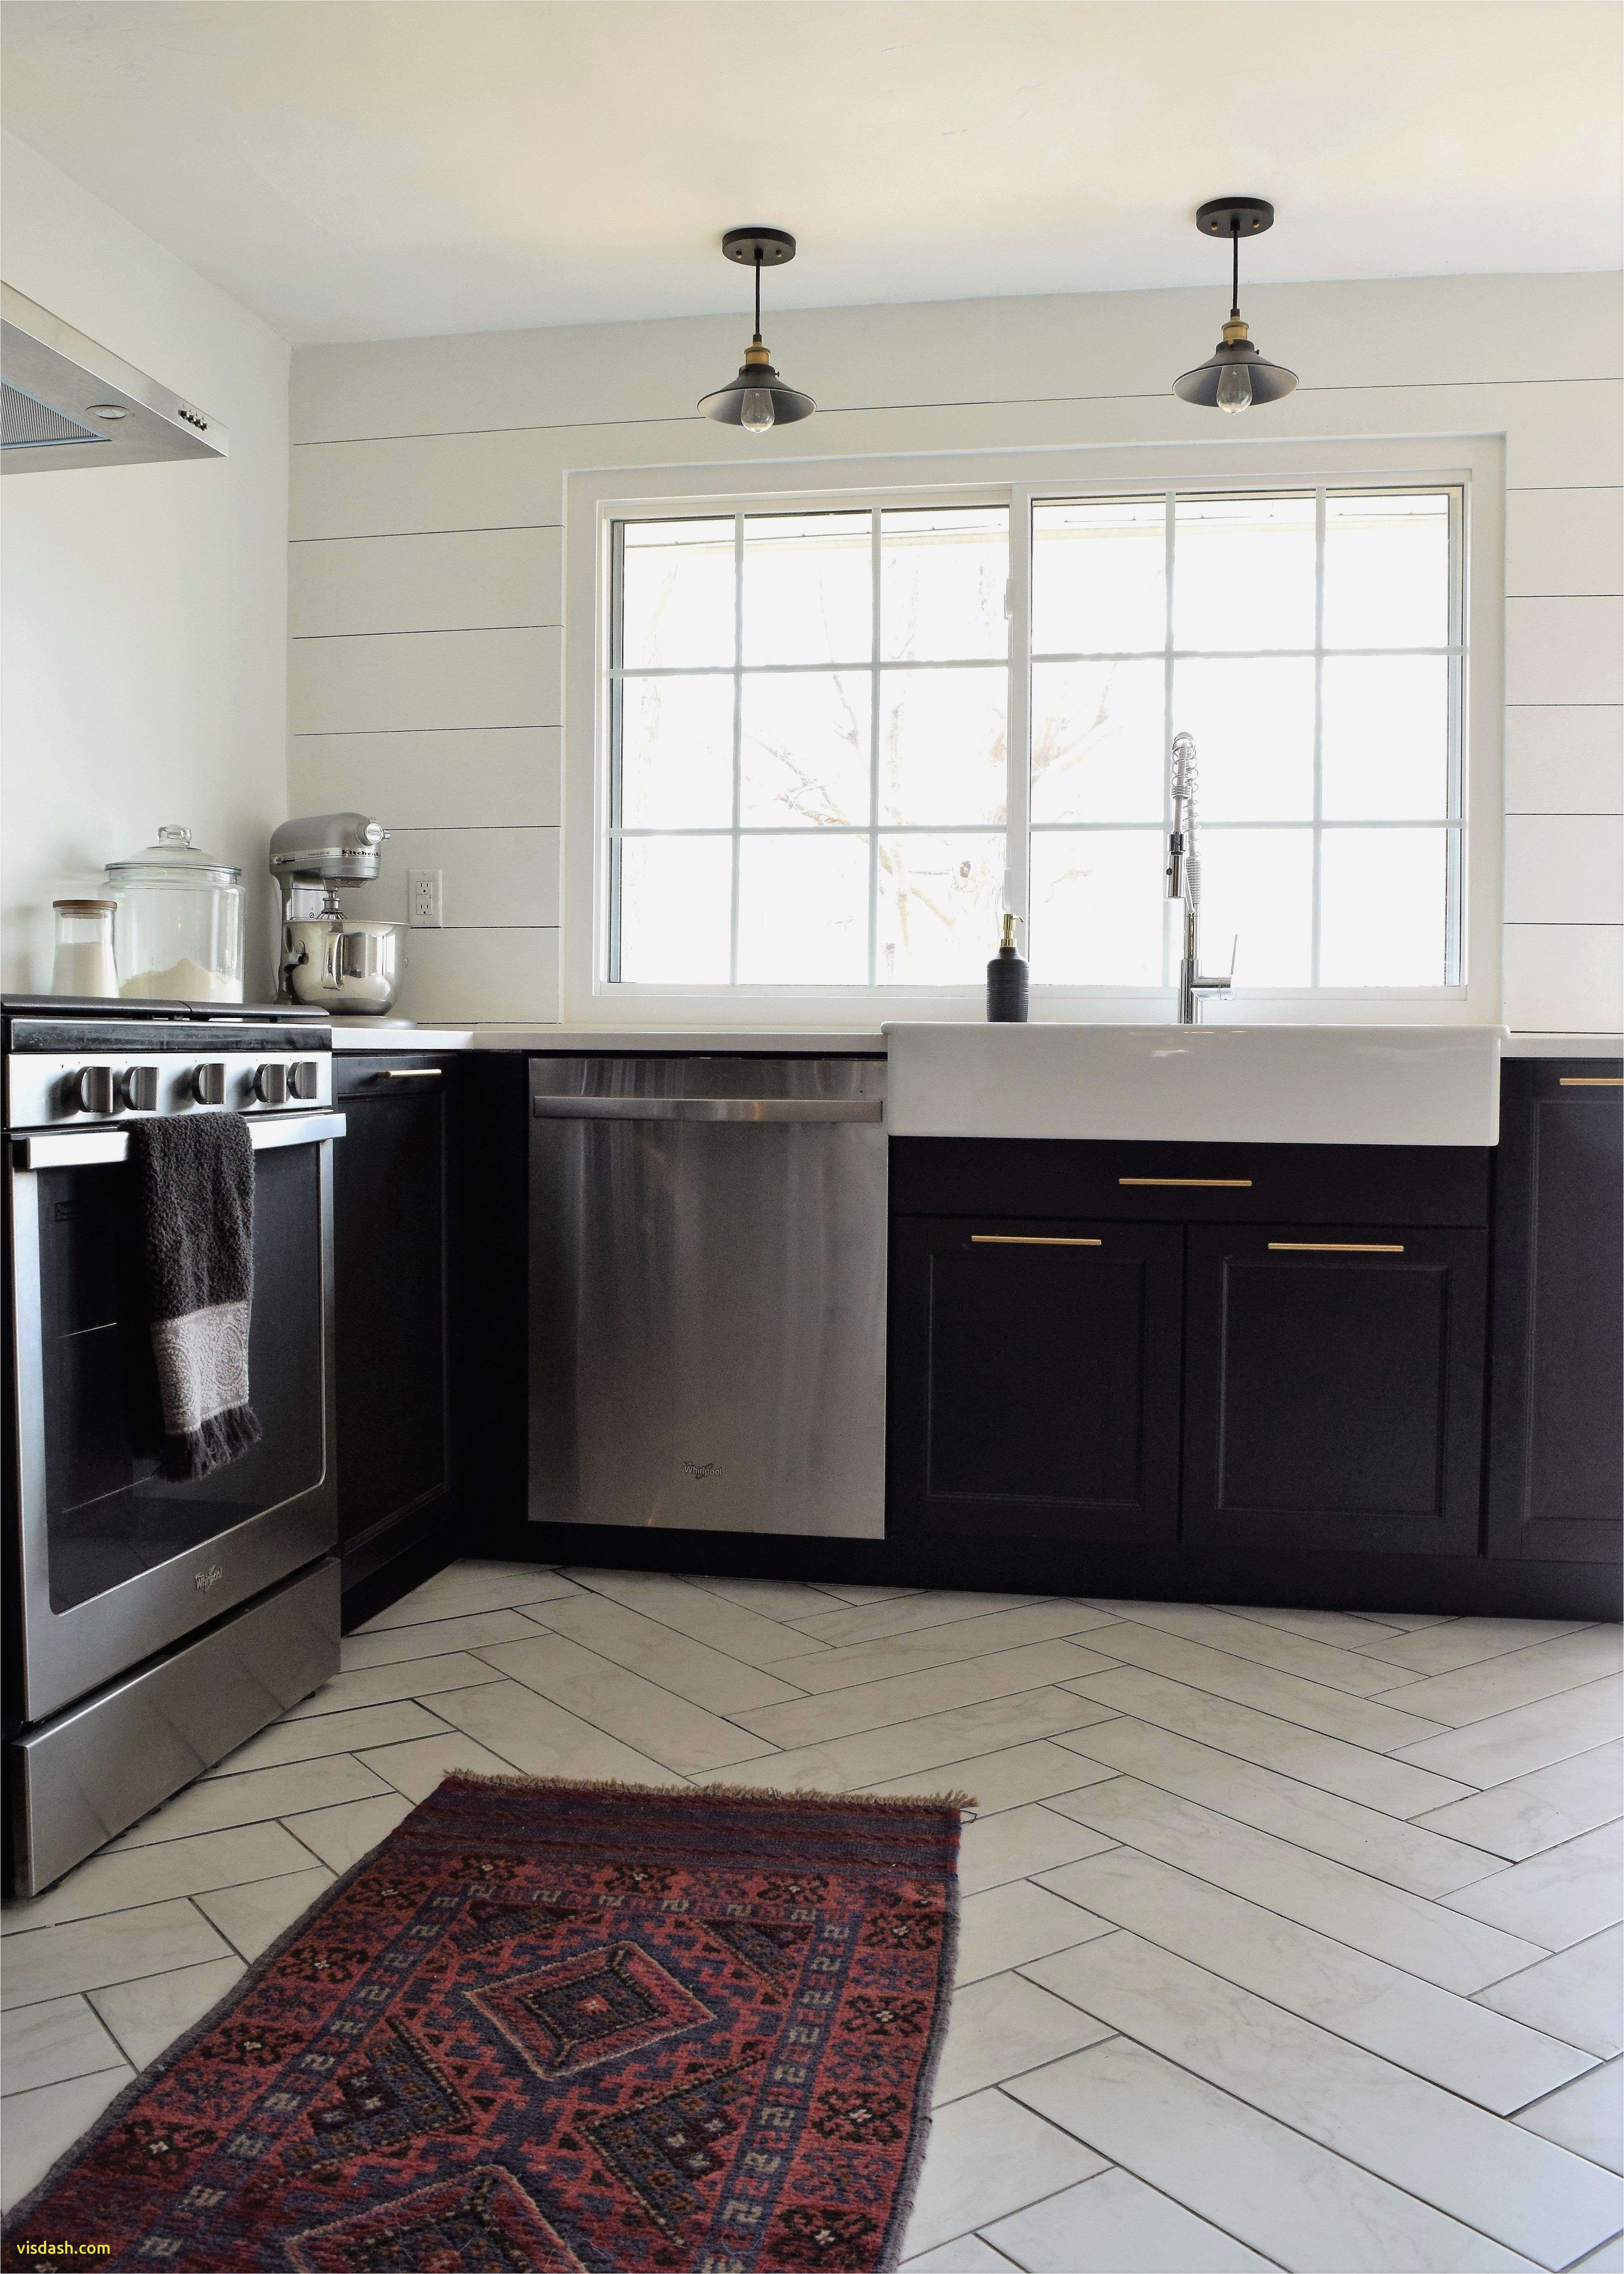 Kitchen Redesign Ideas Tiles for Kitchen Awesome Stunning Tile Kitchen In Kitchen Design 0d